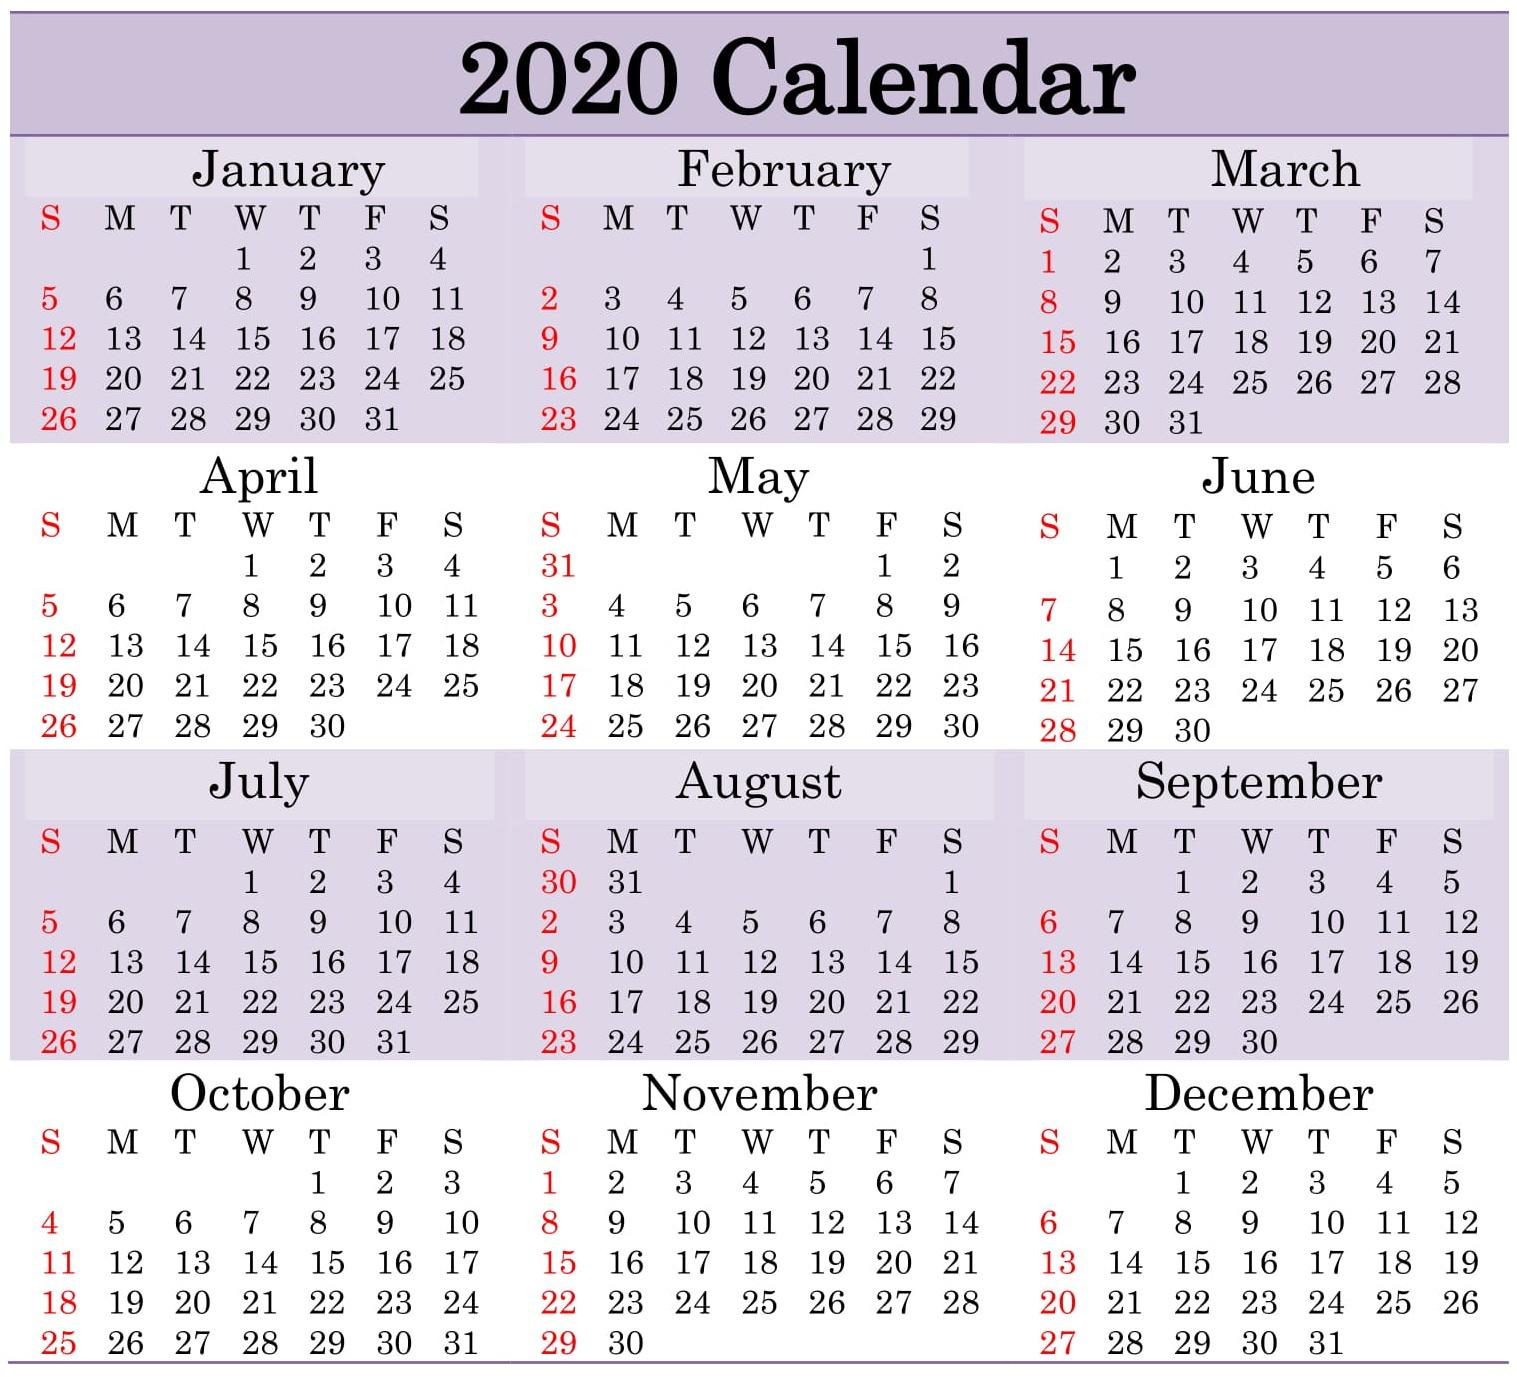 Printable 2020 Calendar Word Document  Latest Printable regarding Julian Date Calendar For 2020